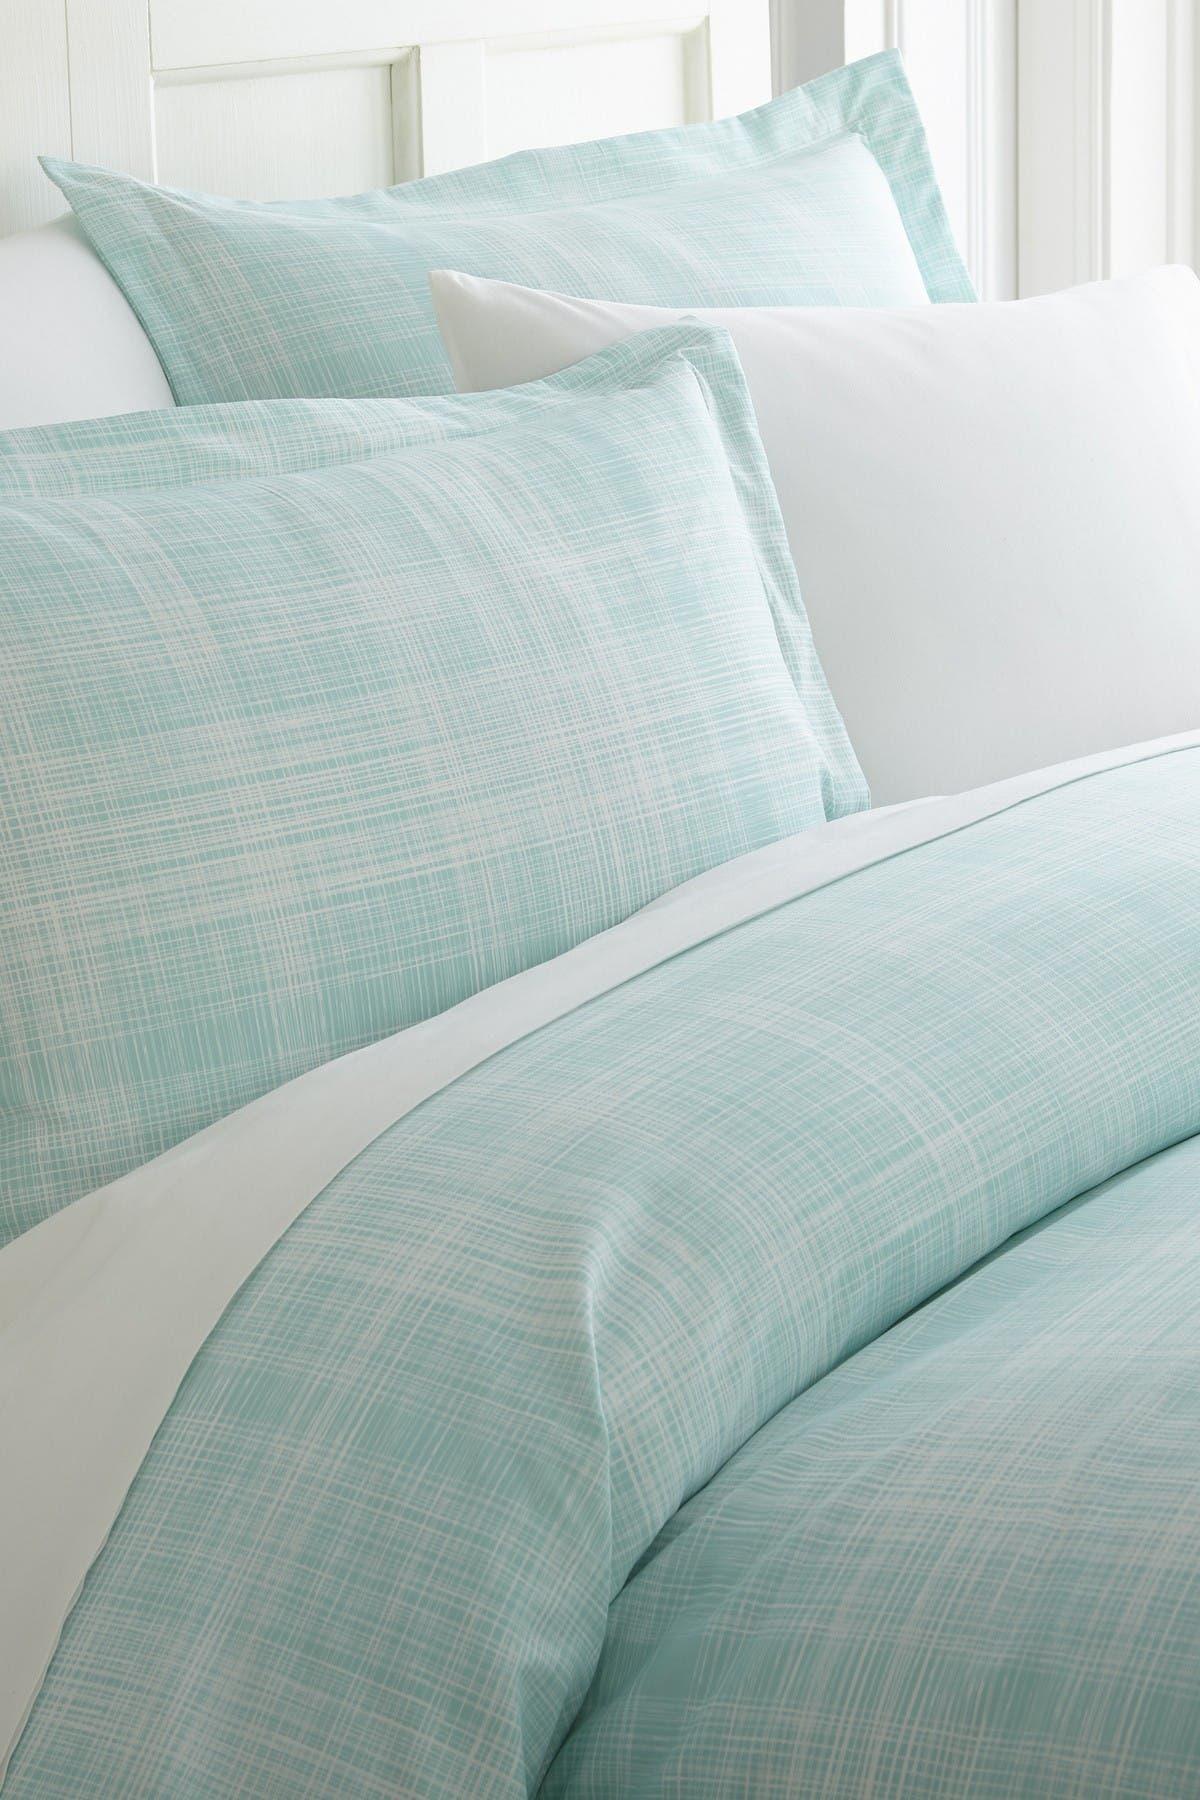 Image of IENJOY HOME Home Spun Premium Ultra Soft Thatch Pattern 2-Piece Duvet Cover Twin Set - Aqua